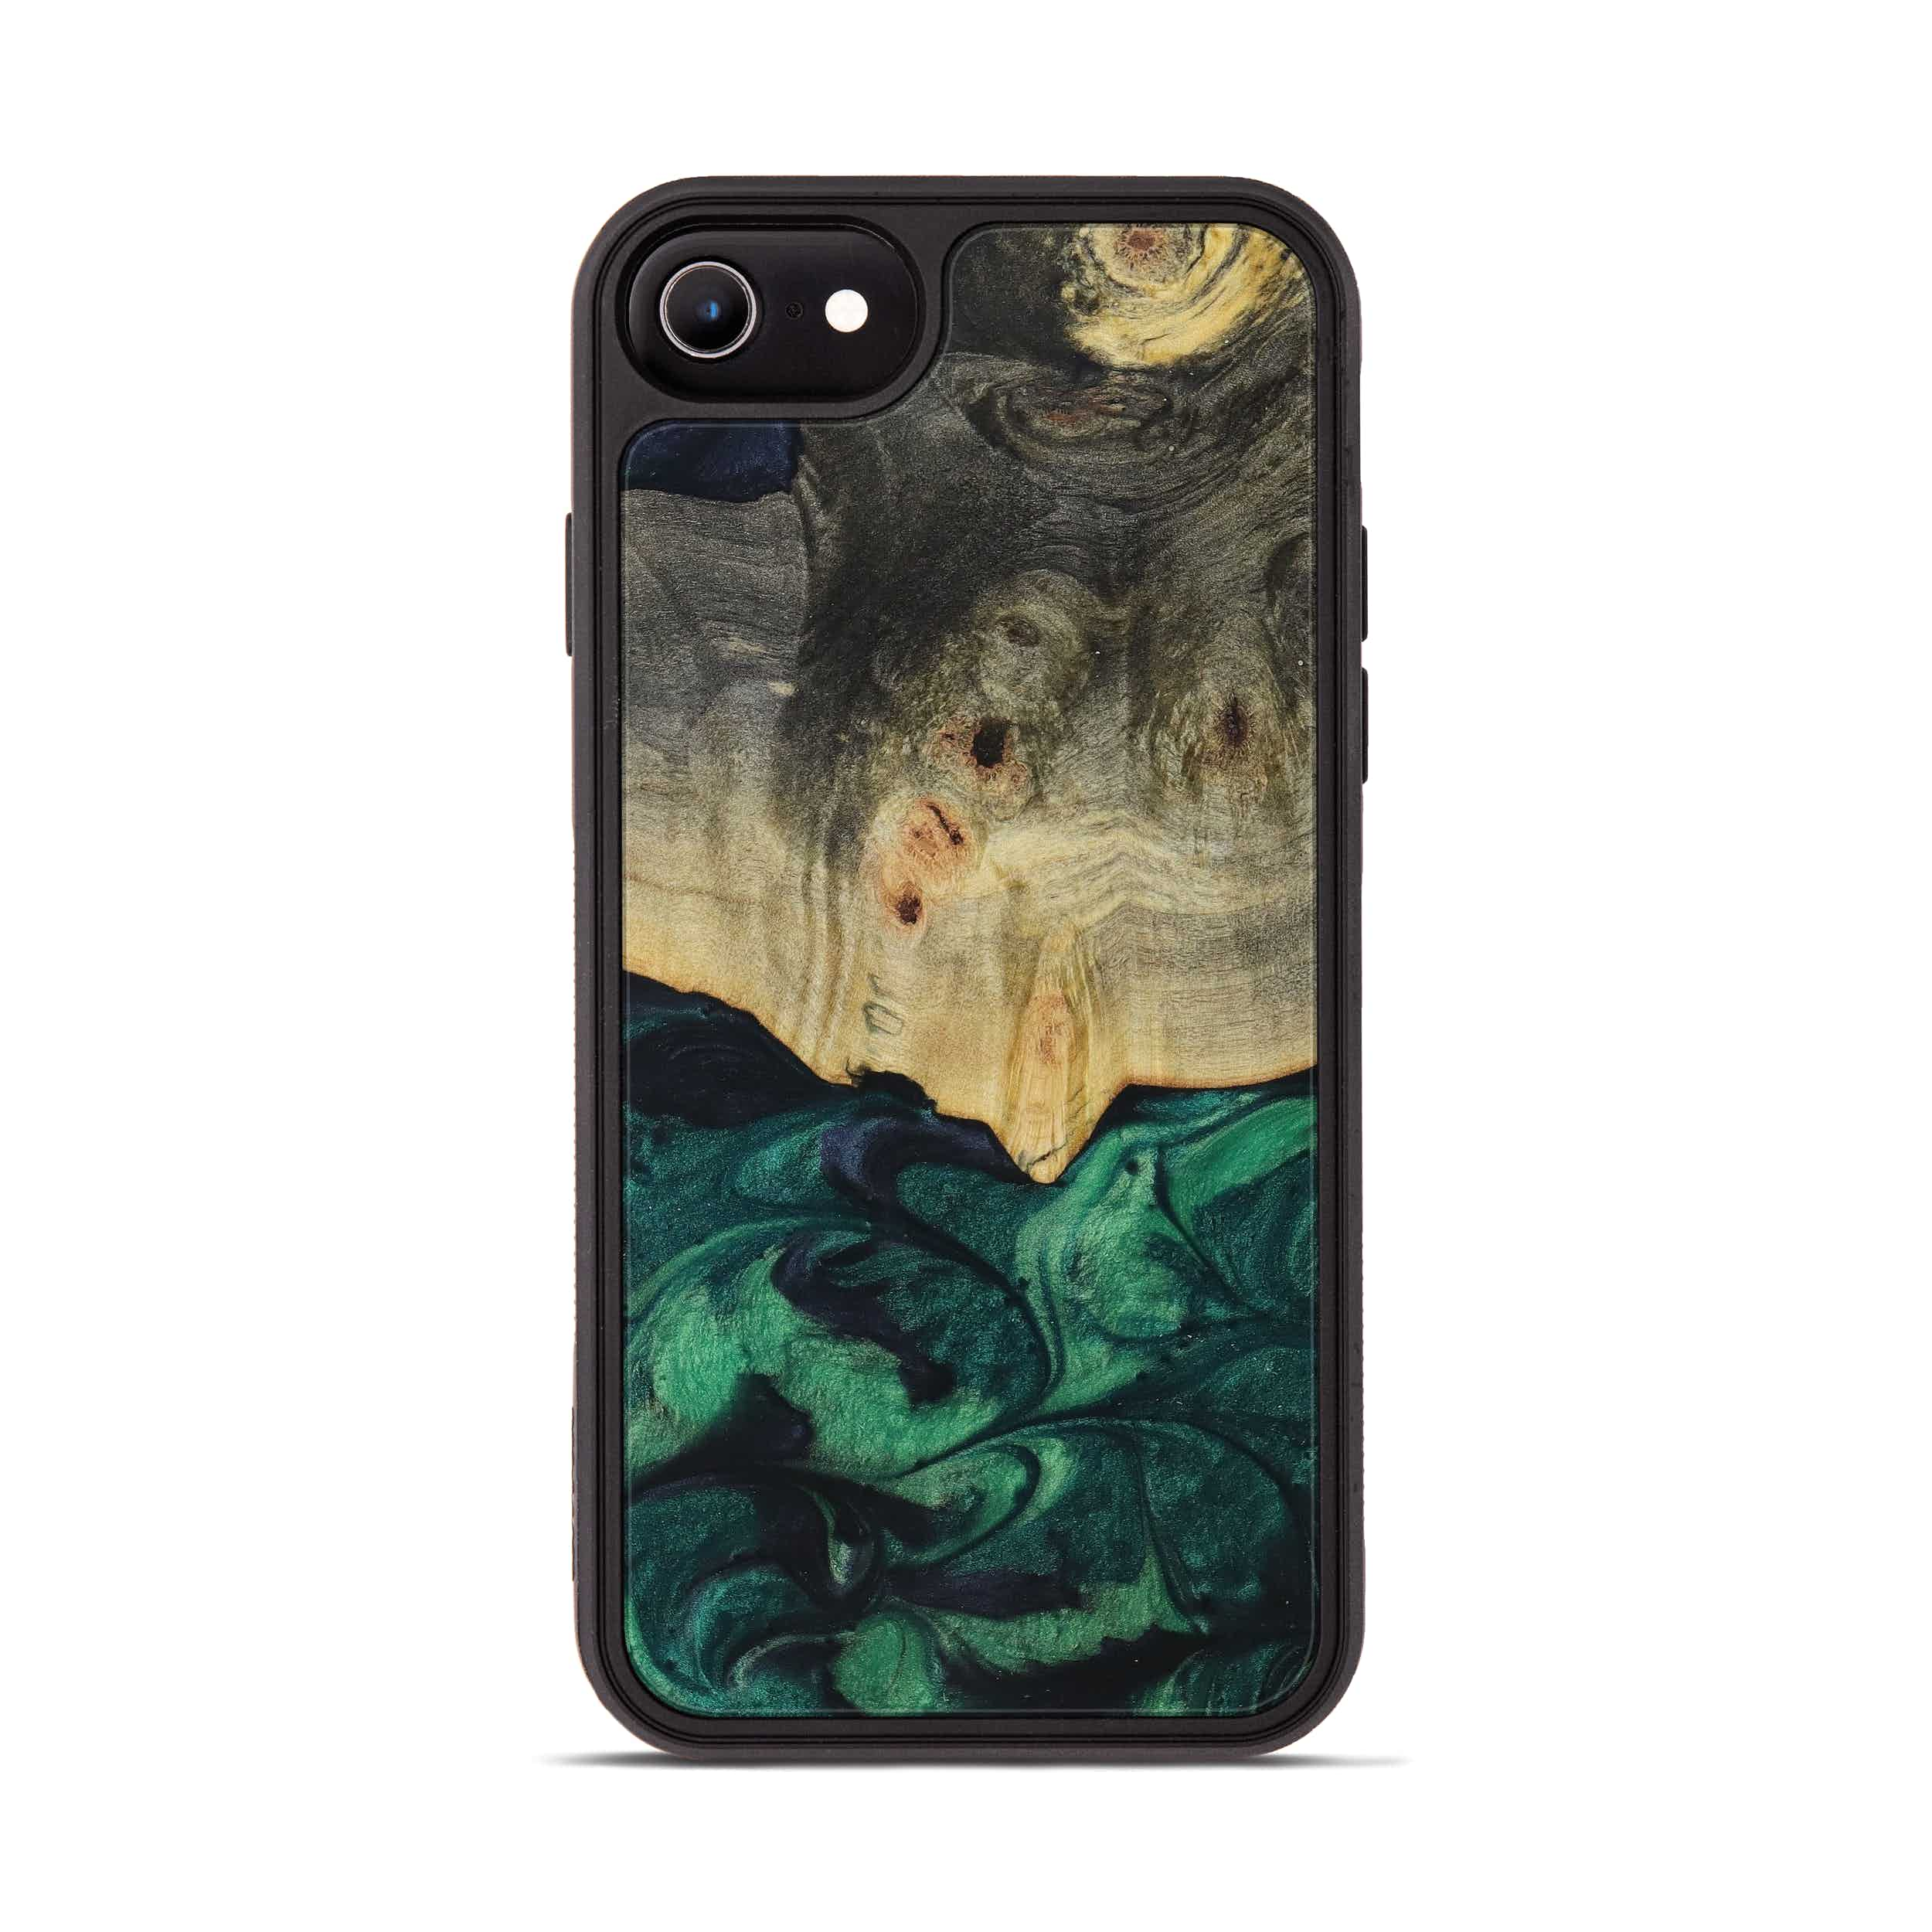 iPhone 8 Wood+Resin Phone Case - Ivo (Dark Green, 394669)